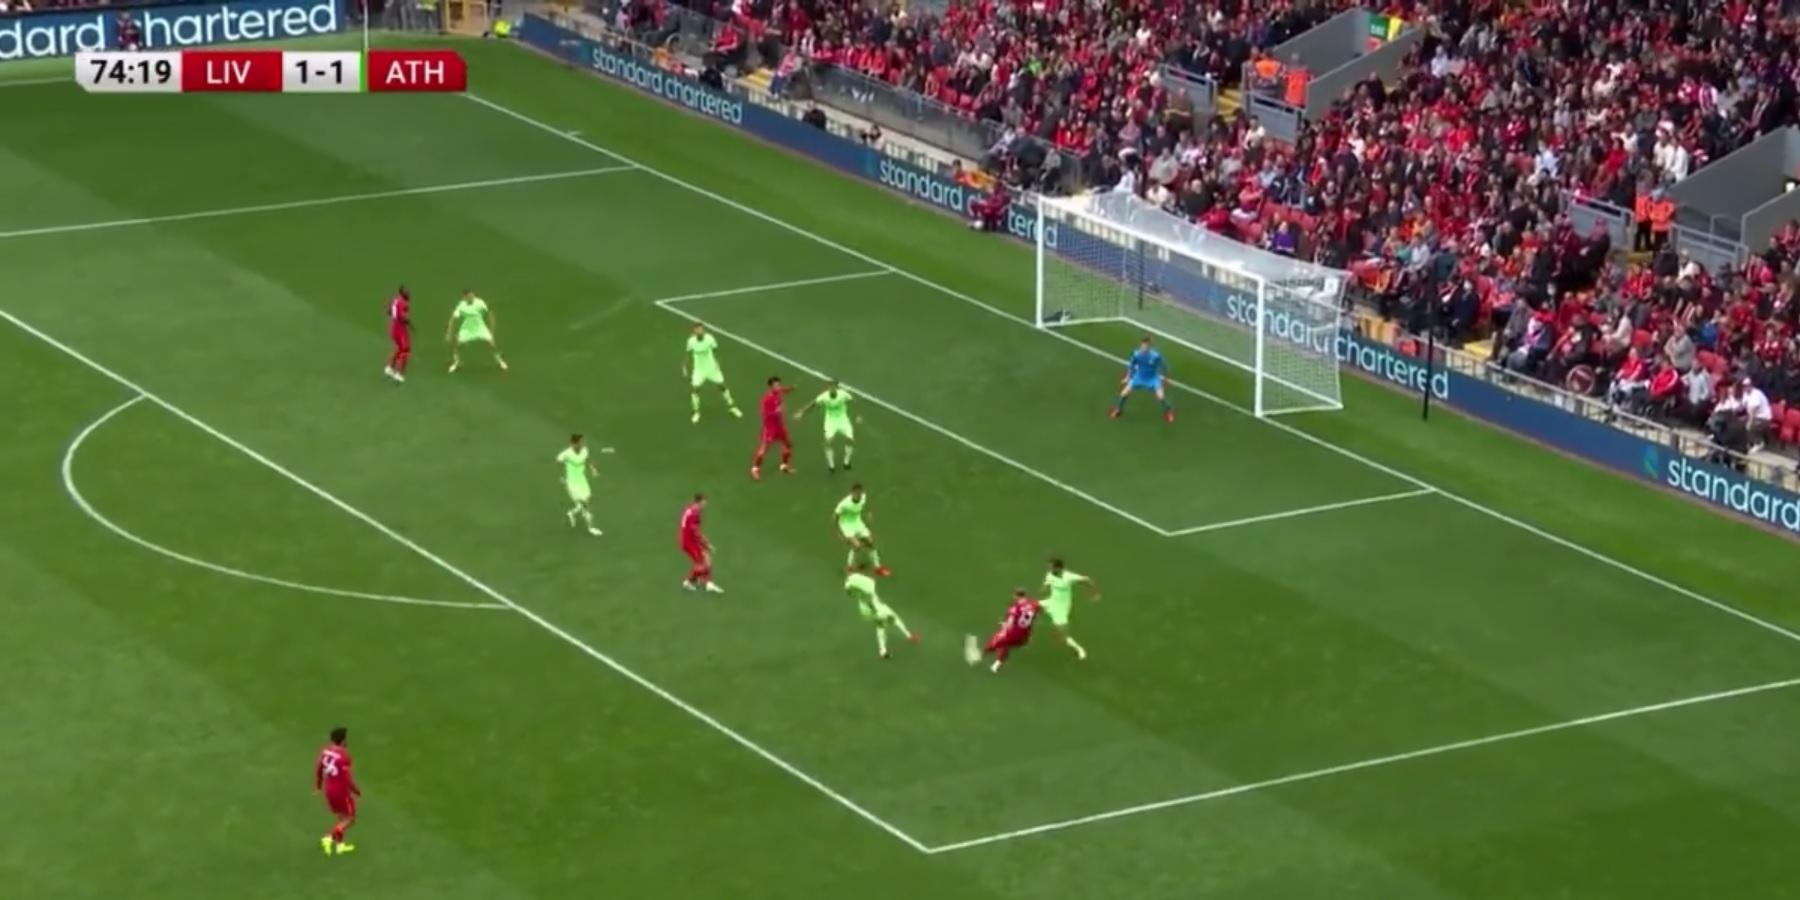 (Video) Harvey Elliott's highlights v. Athletic show LFC have an absolute gem on their hands